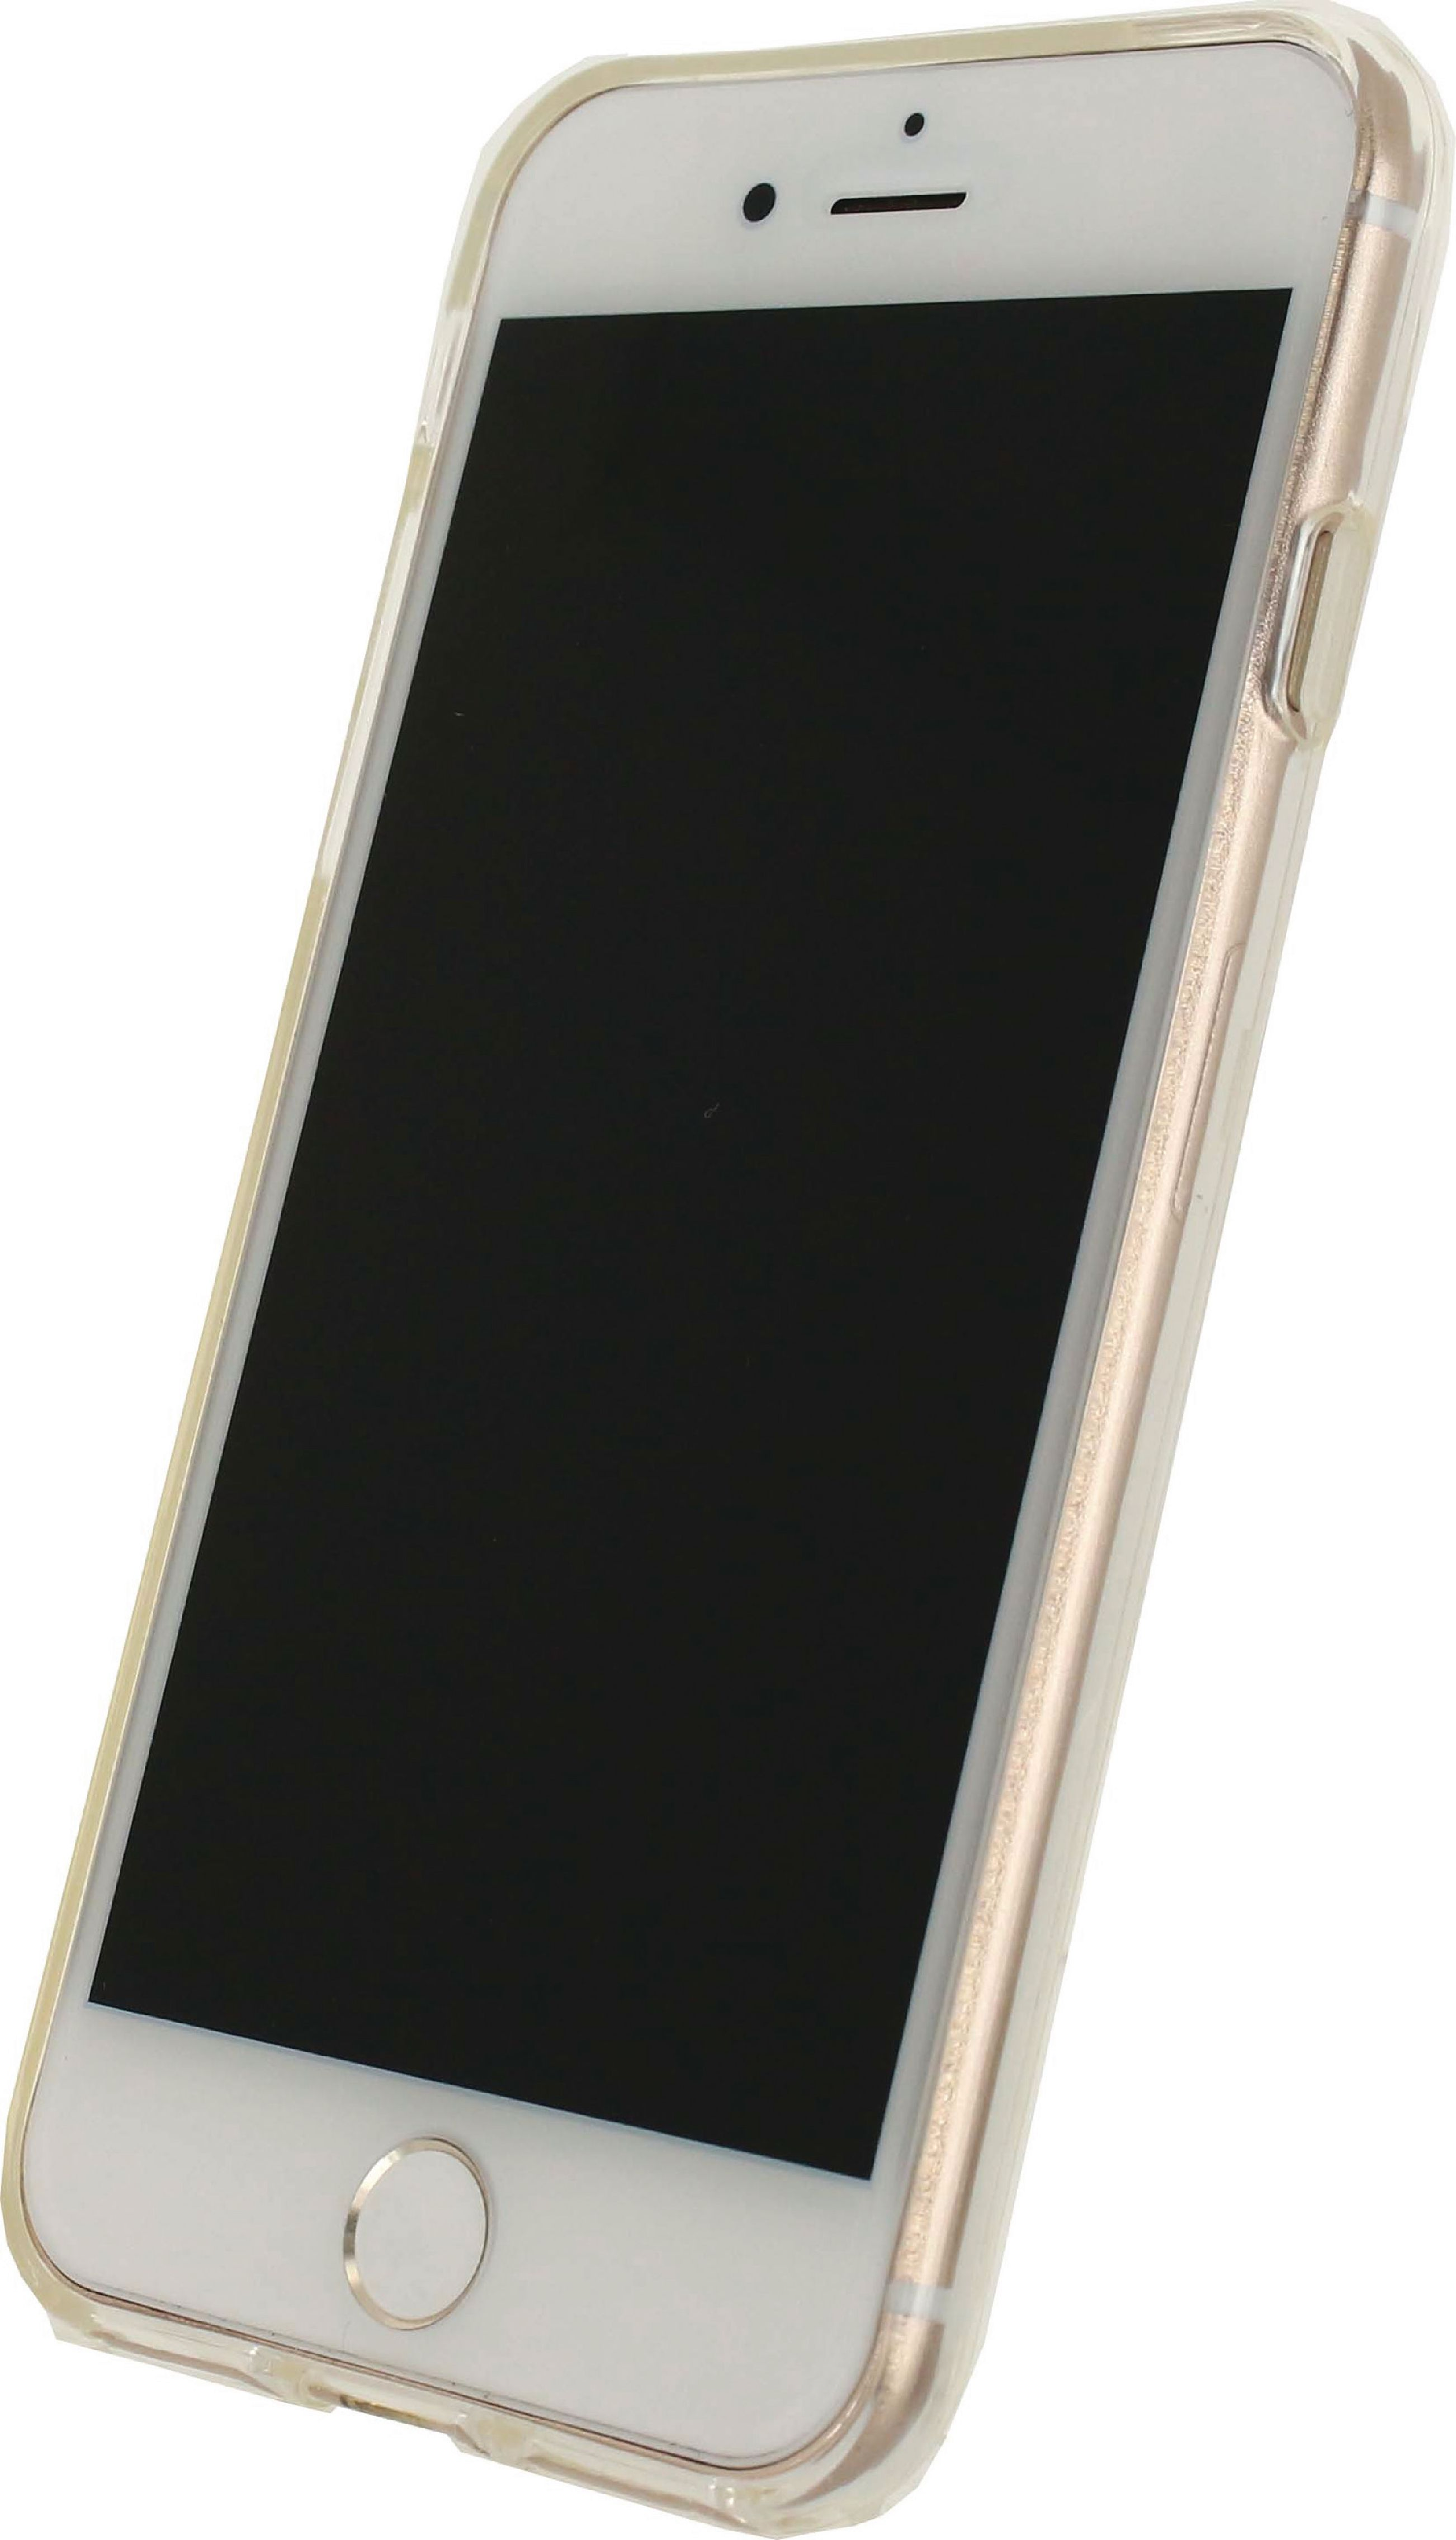 Image of   Telefon Gel-Etui Apple iPhone 7 / Apple iPhone 8 Gennemsigtig